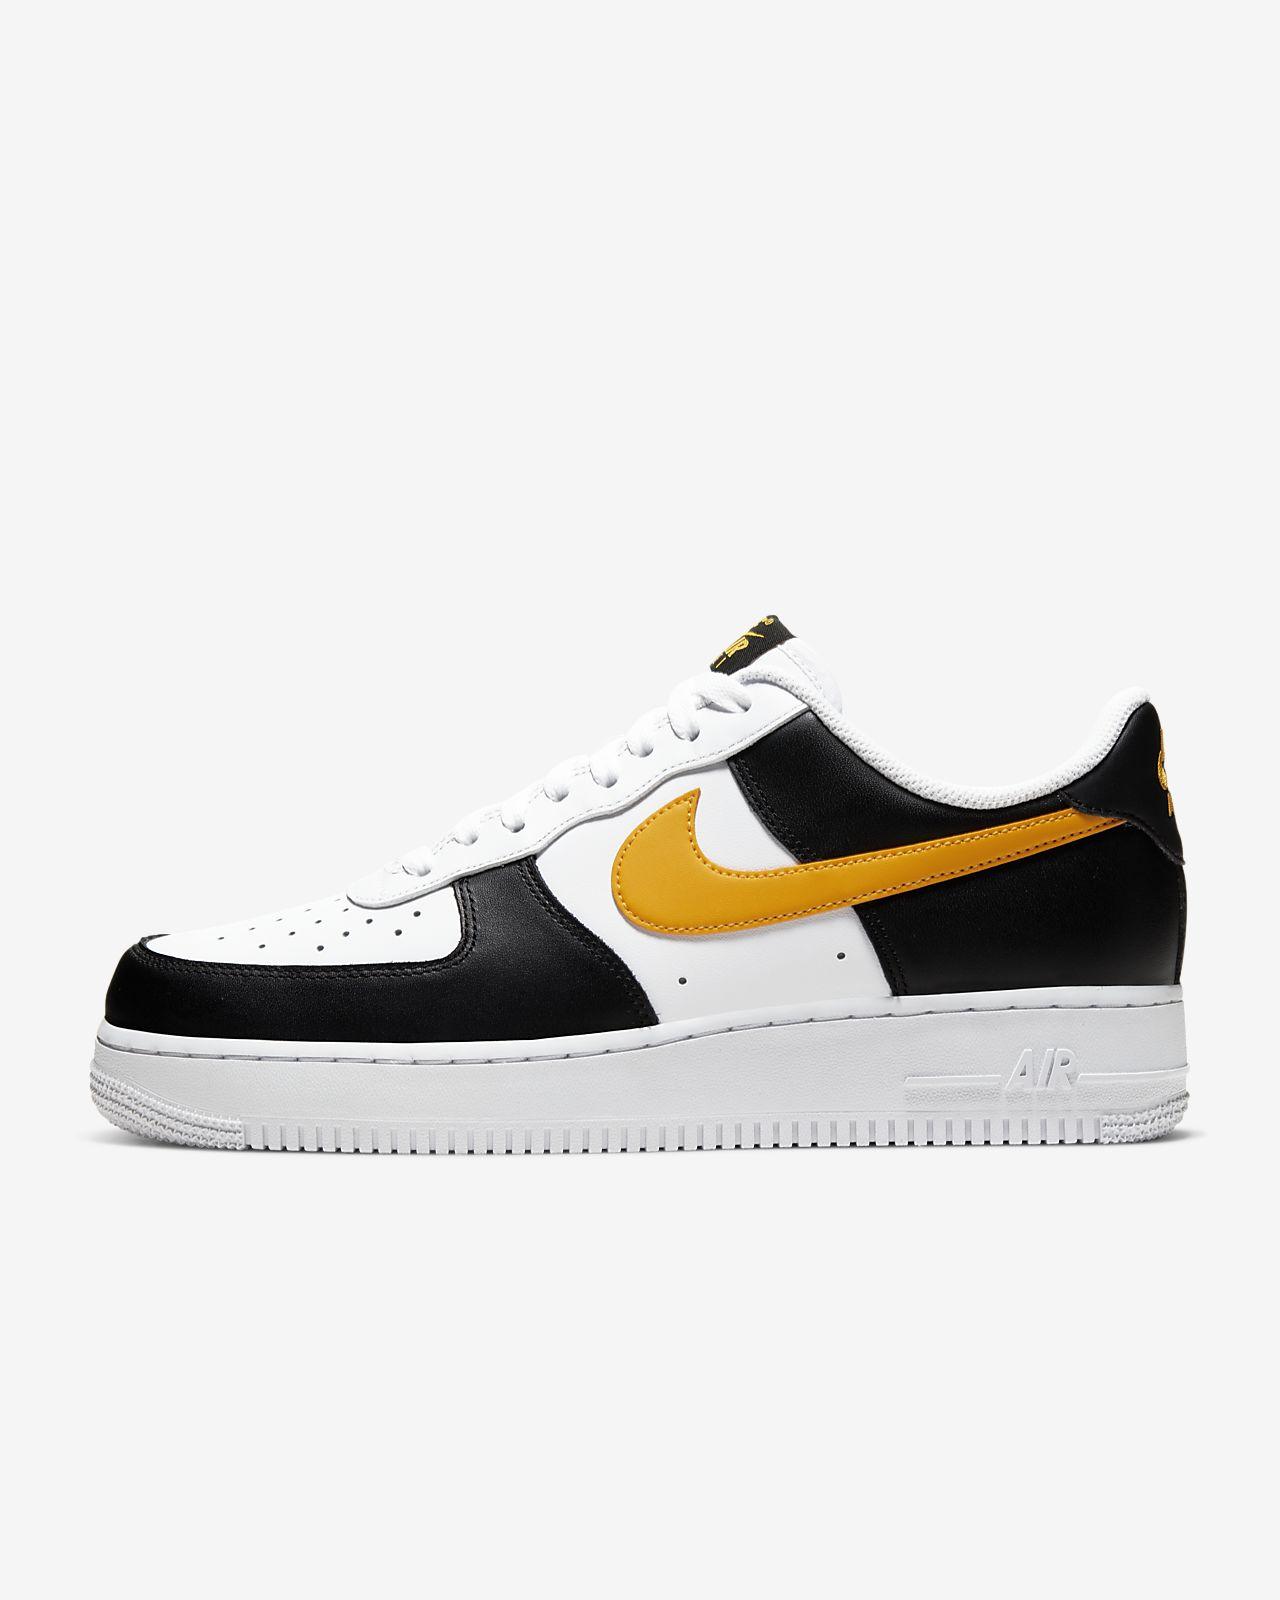 Nike Air Force 1 '07 RS 男鞋